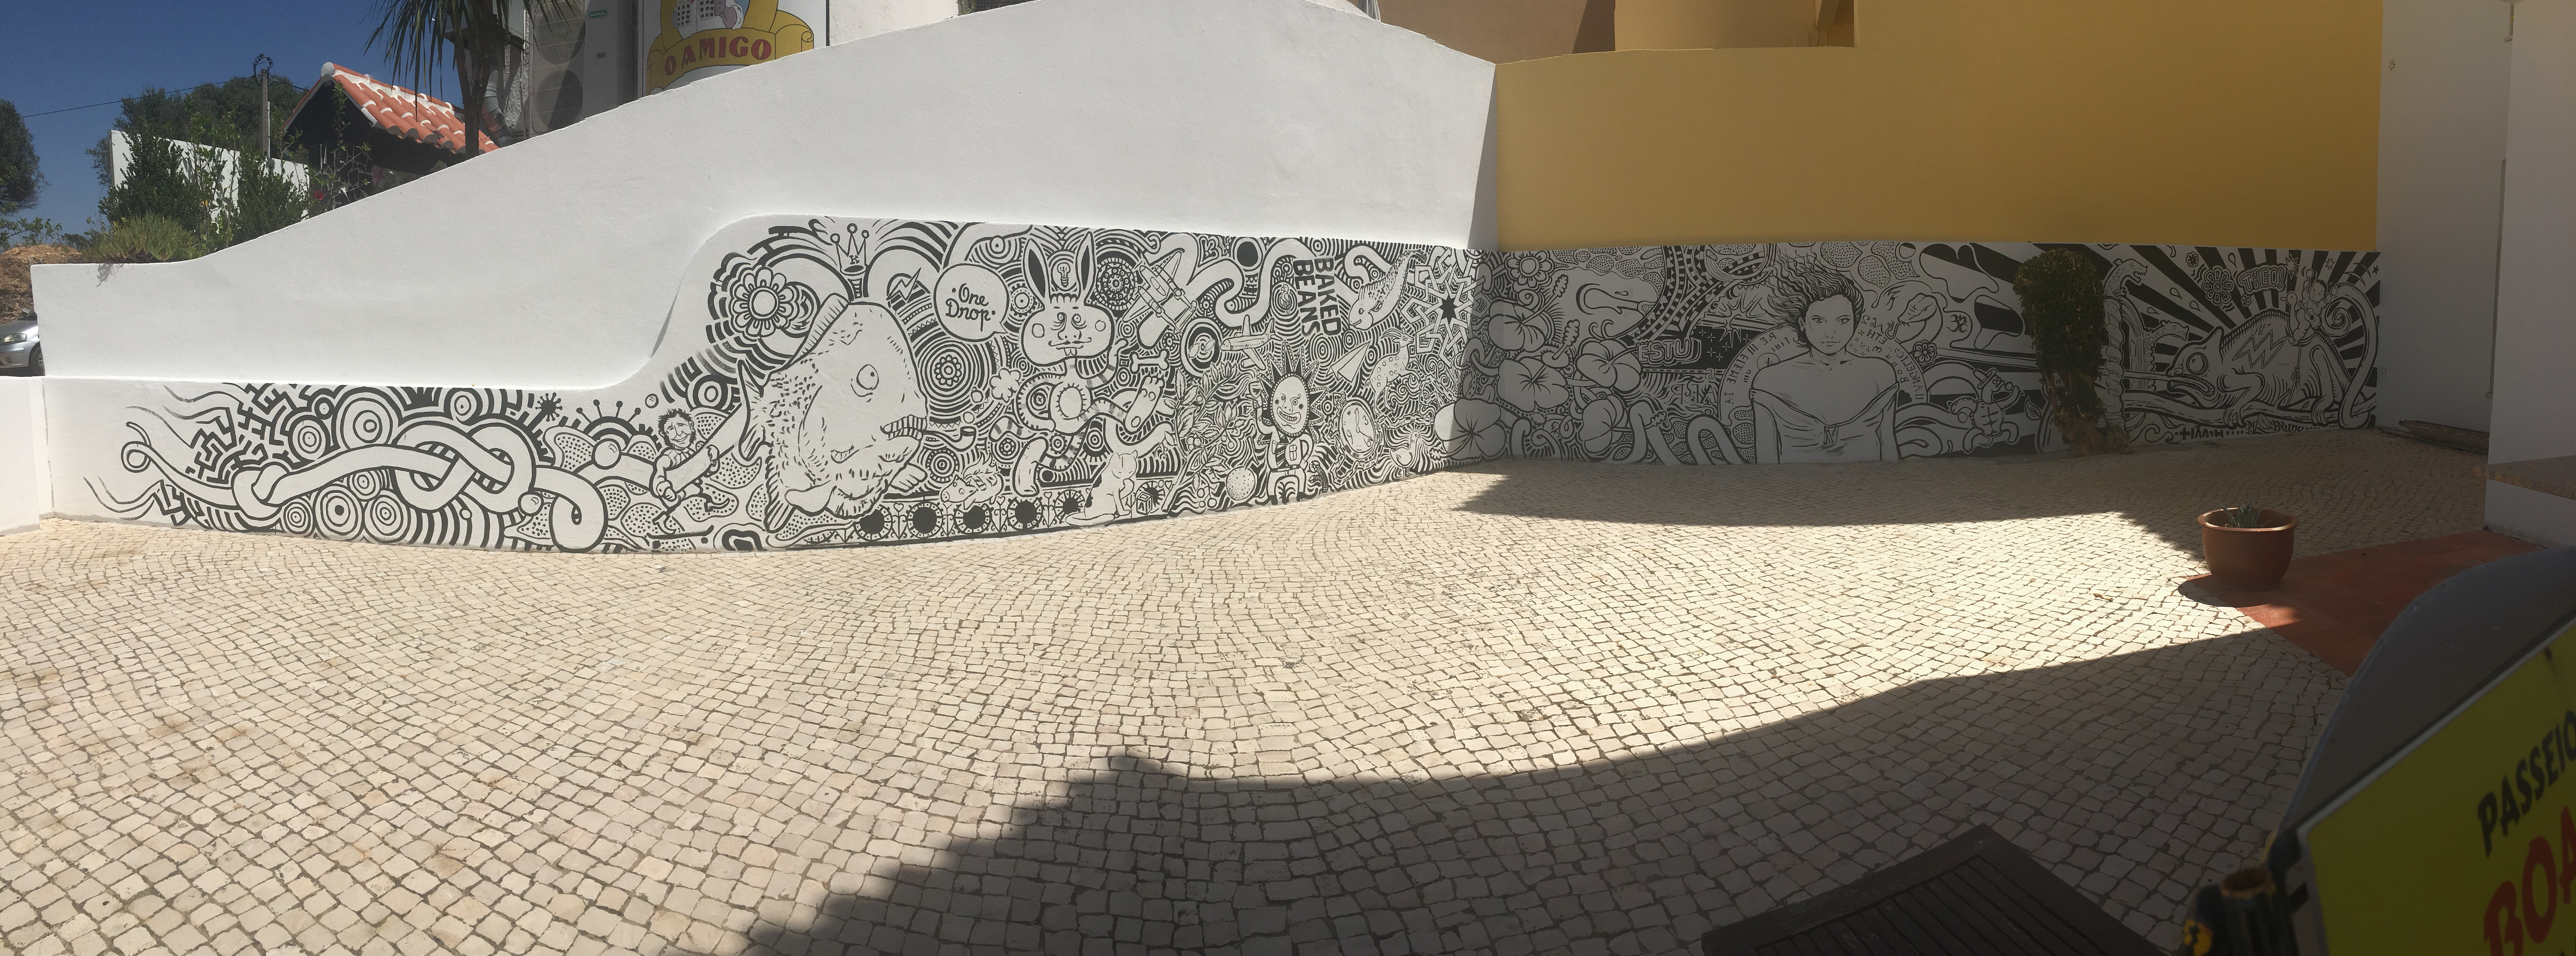 Street art at The Big Chill Hostel in Lagos, Algarve, Portugal